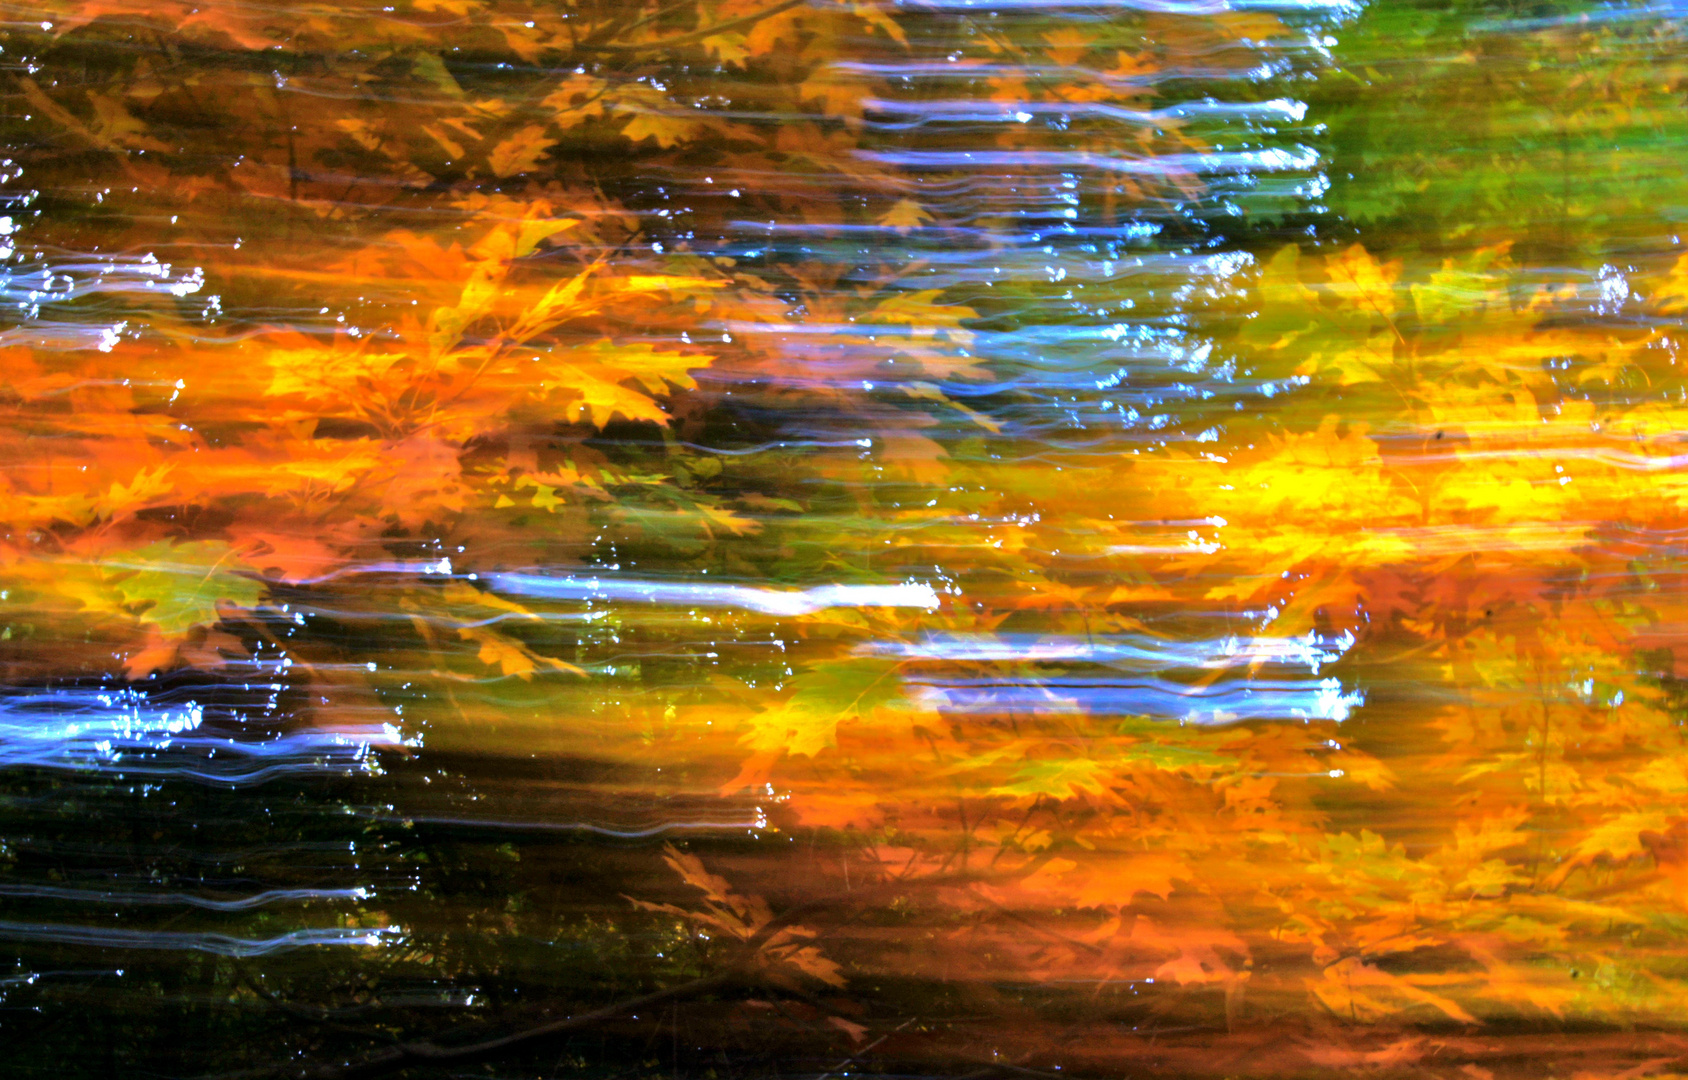 Herbst-Impressionen VI